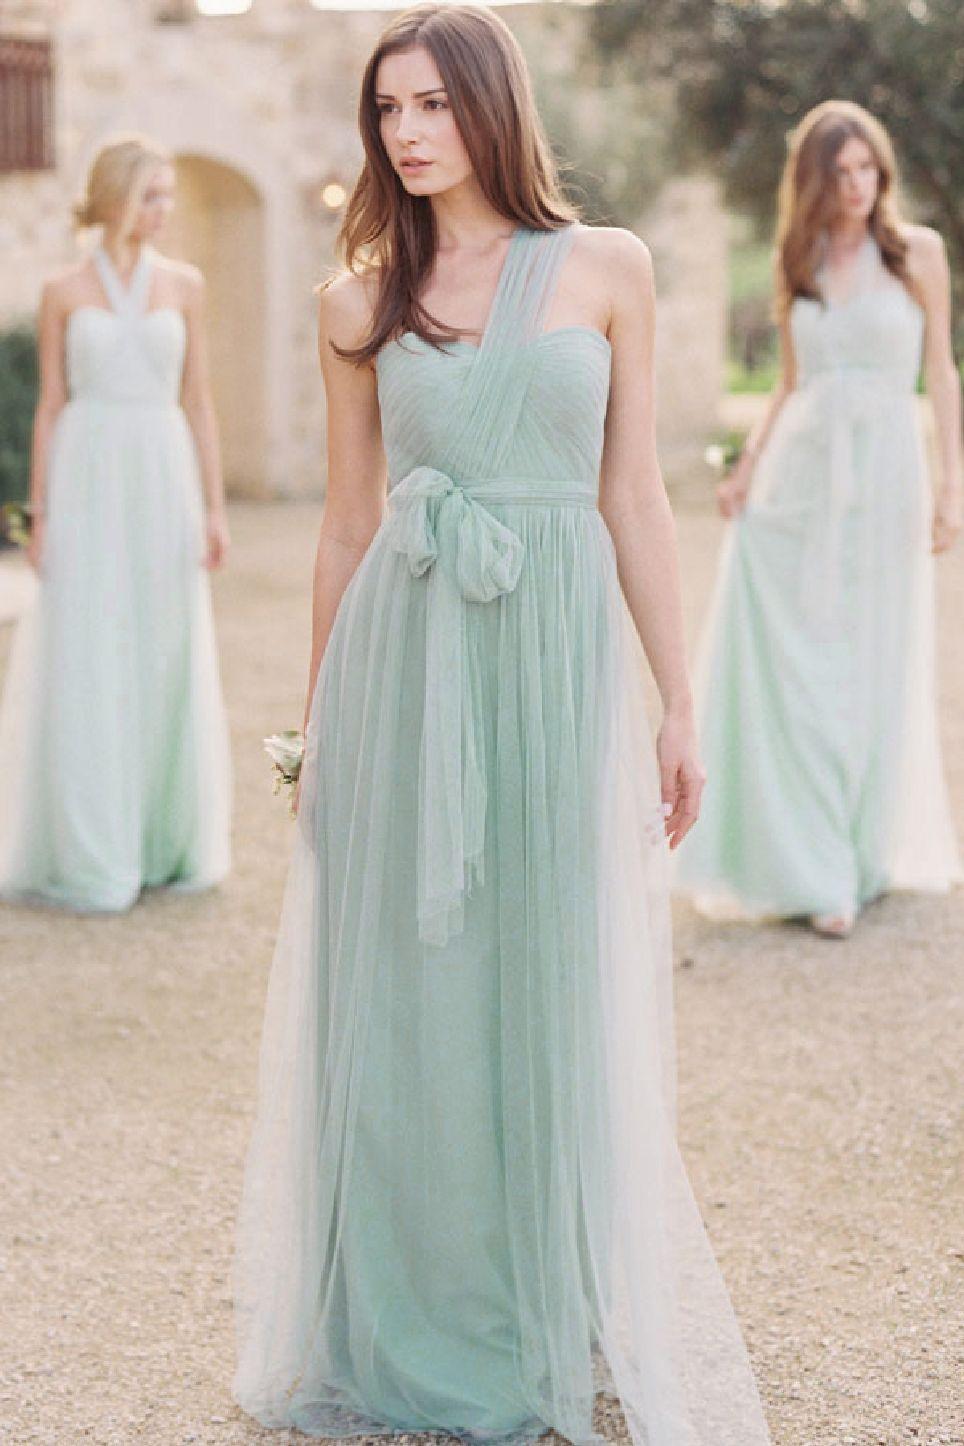 Bridesmaid dresses spearmint sea glass wedding pinterest bridesmaid dresses spearmint sea glass ombrellifo Choice Image